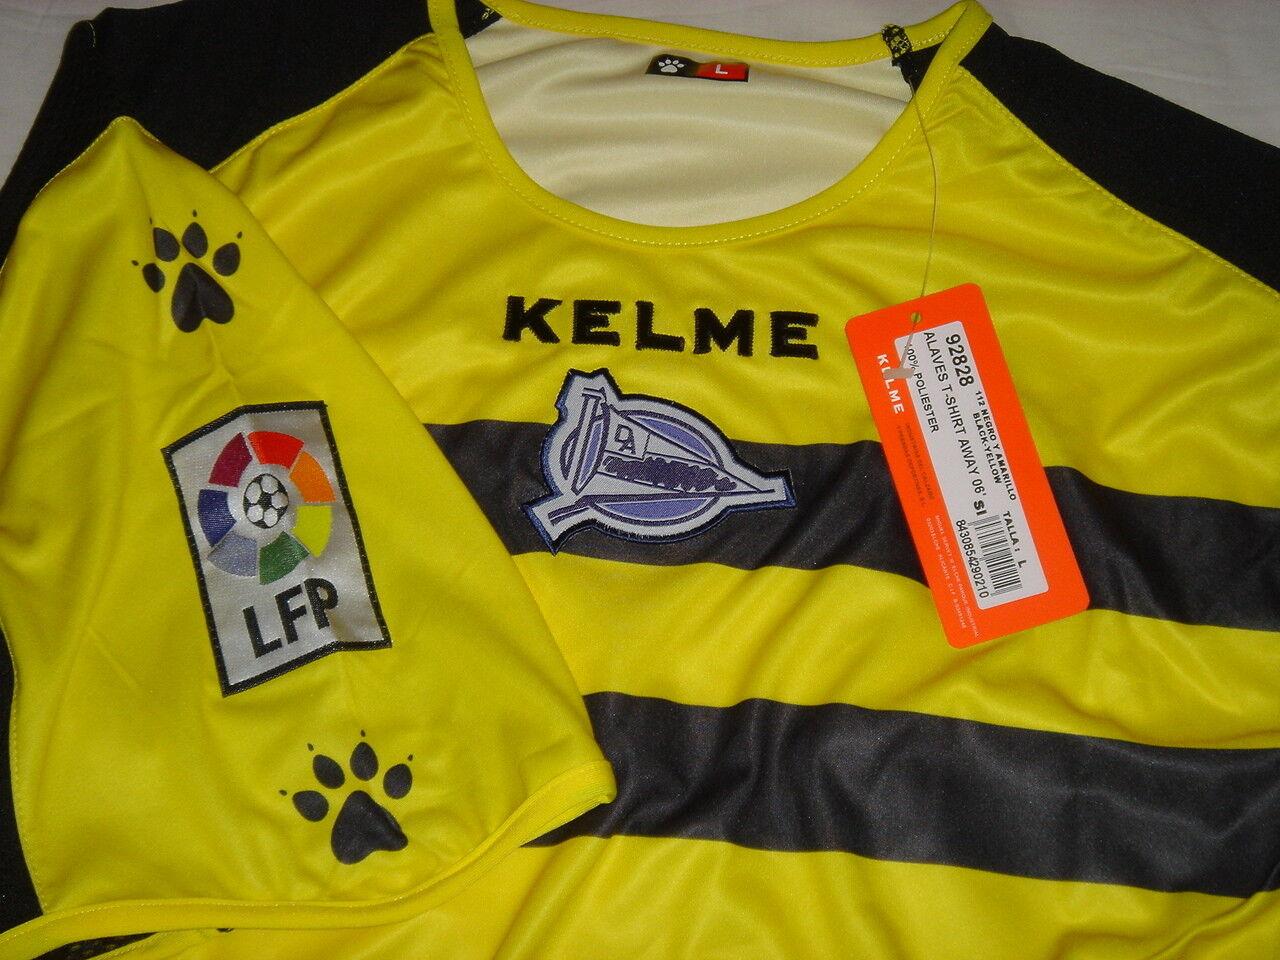 Camiseta de fútbol fútbol fútbol Alaves Kelme Nueva  L XL f060cf